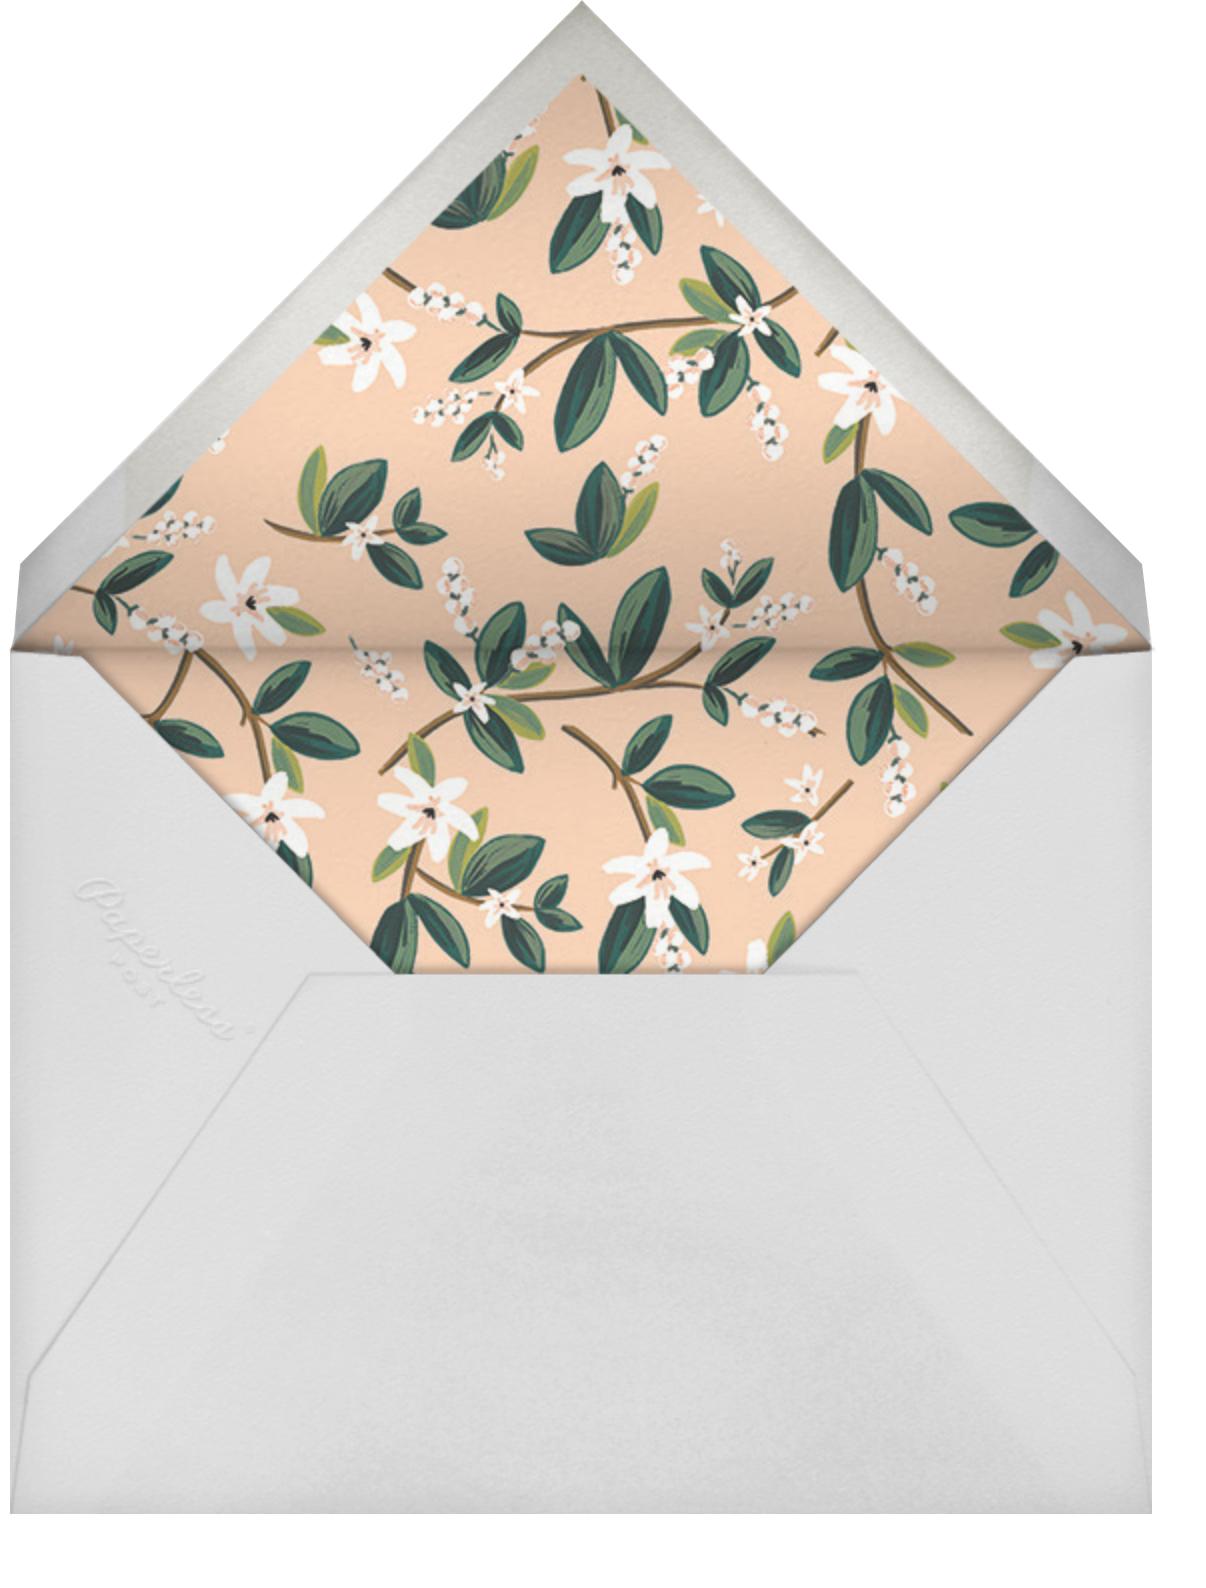 November Herbarium (Invitation) - Rifle Paper Co. - Memorial service - envelope back